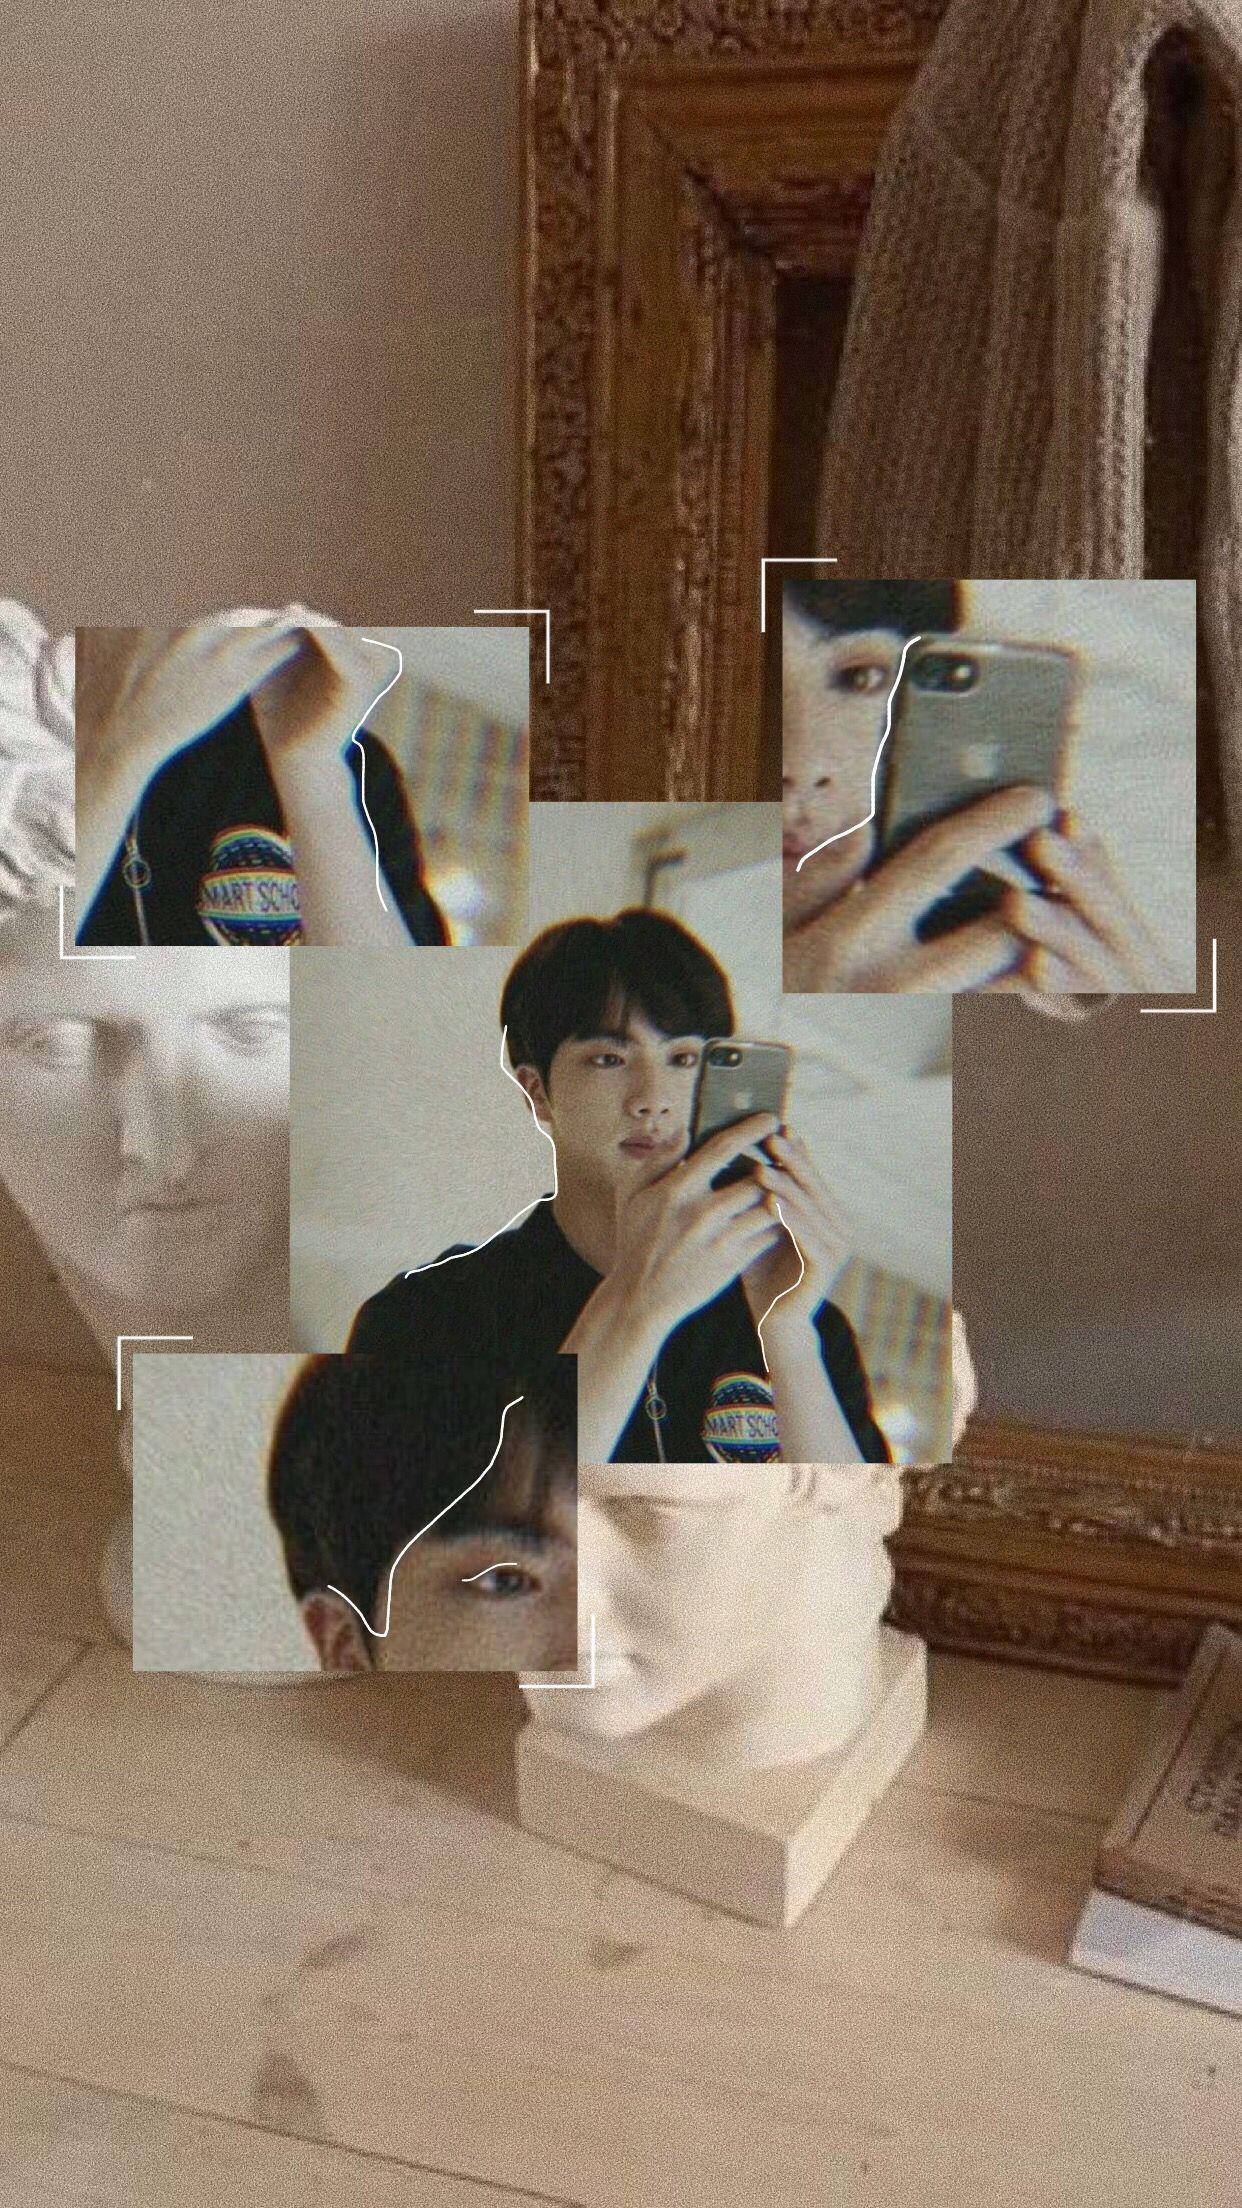 Bts Jin Aesthetic Bts Bangtan Jin Seokjin Aesthetic Tumblr Kpop Gambar Artis Gambar Kota